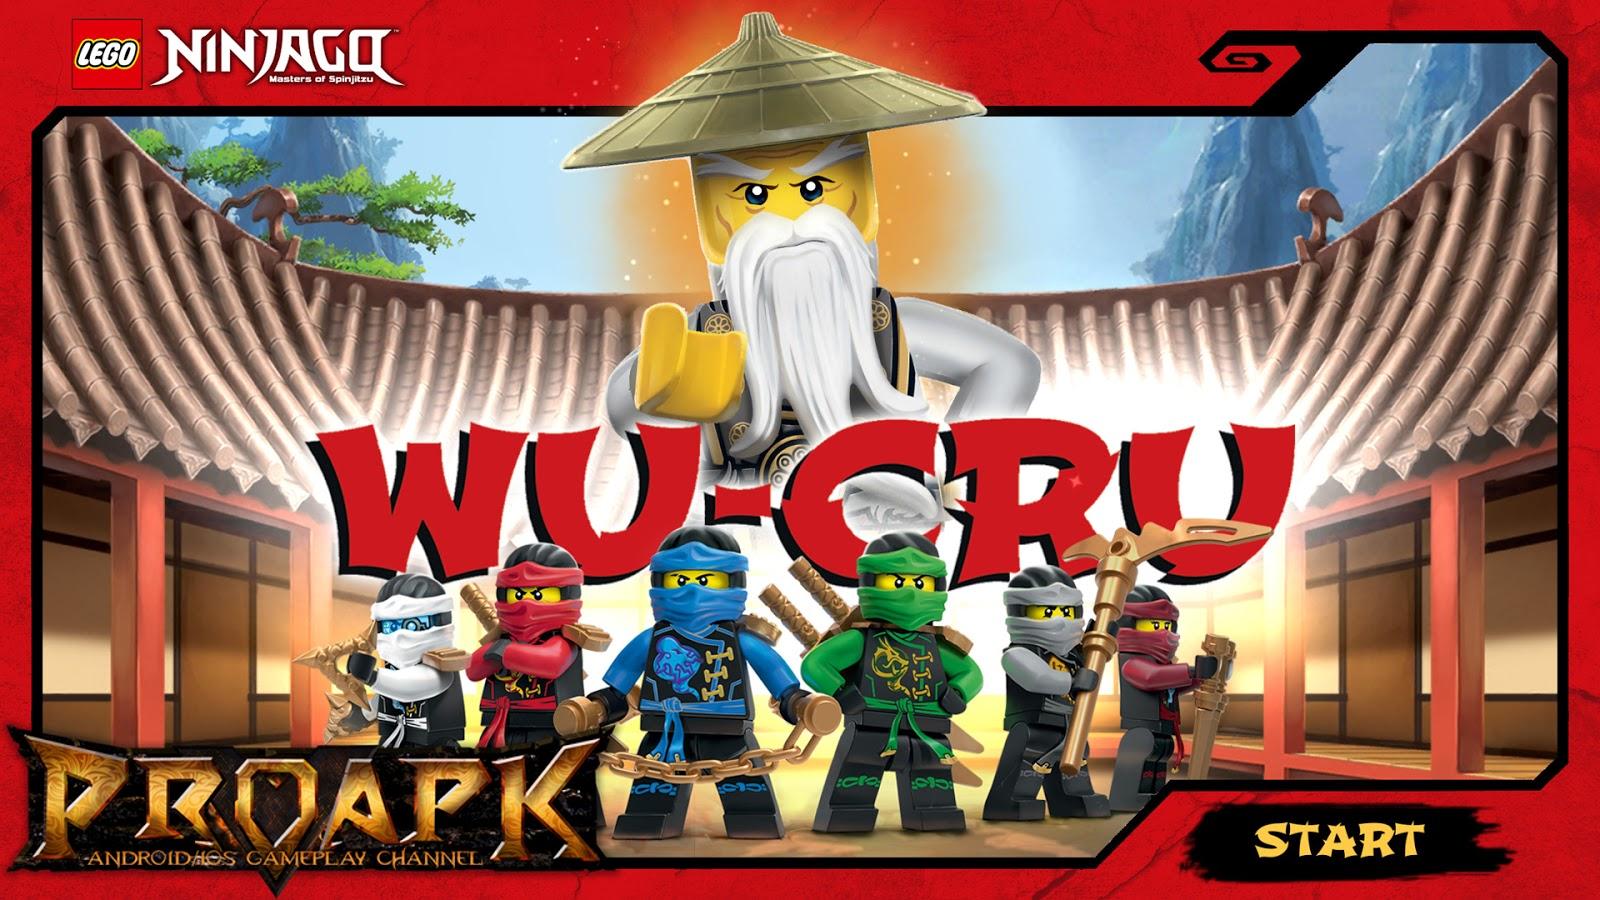 Lego Ninjago Wu Cru Gameplay Ios Android Proapk Android Ios